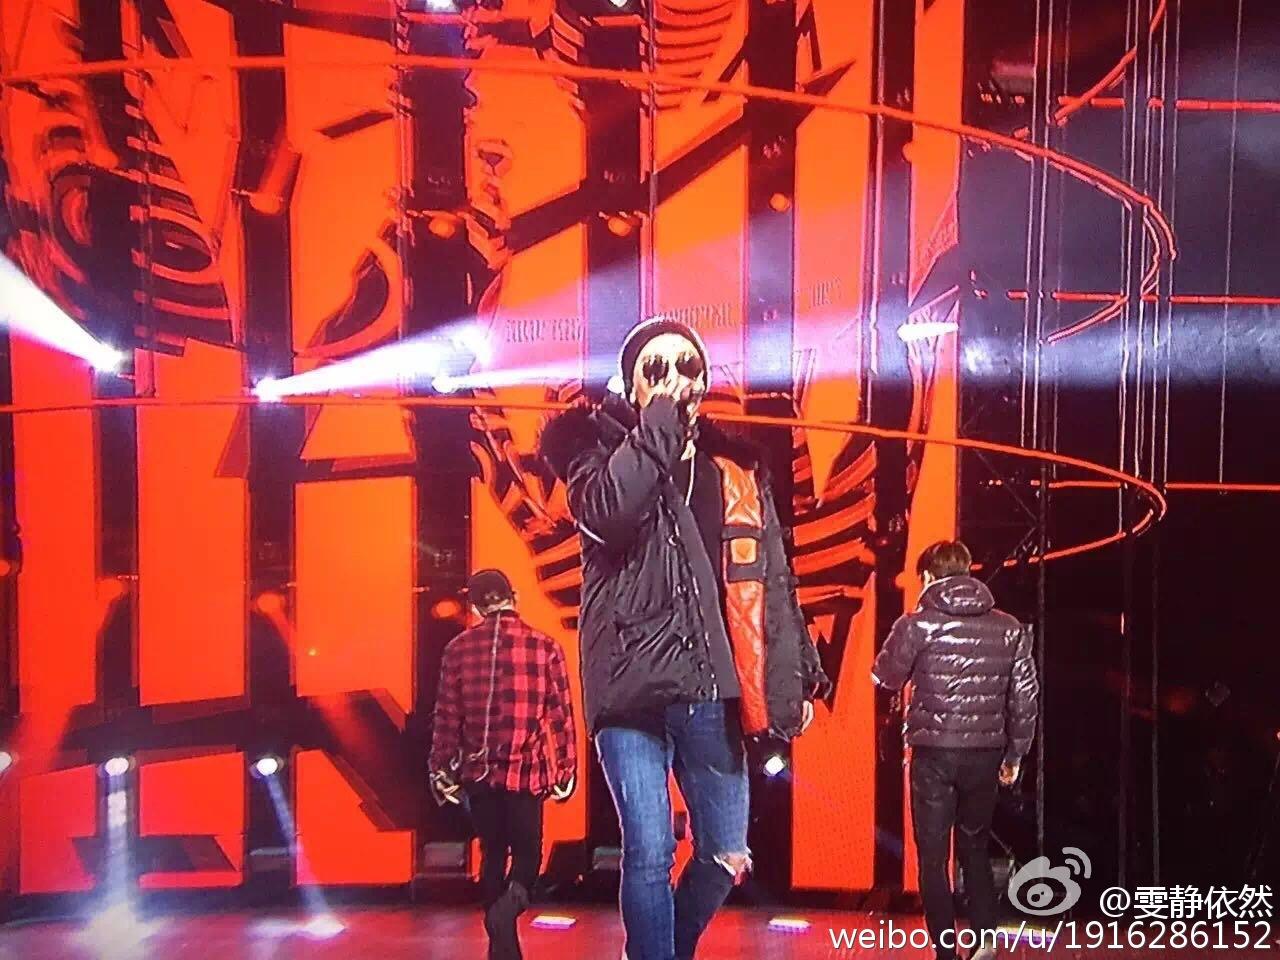 BIGBANG Rehearsals Hunan TV 31-12-2015 (7)